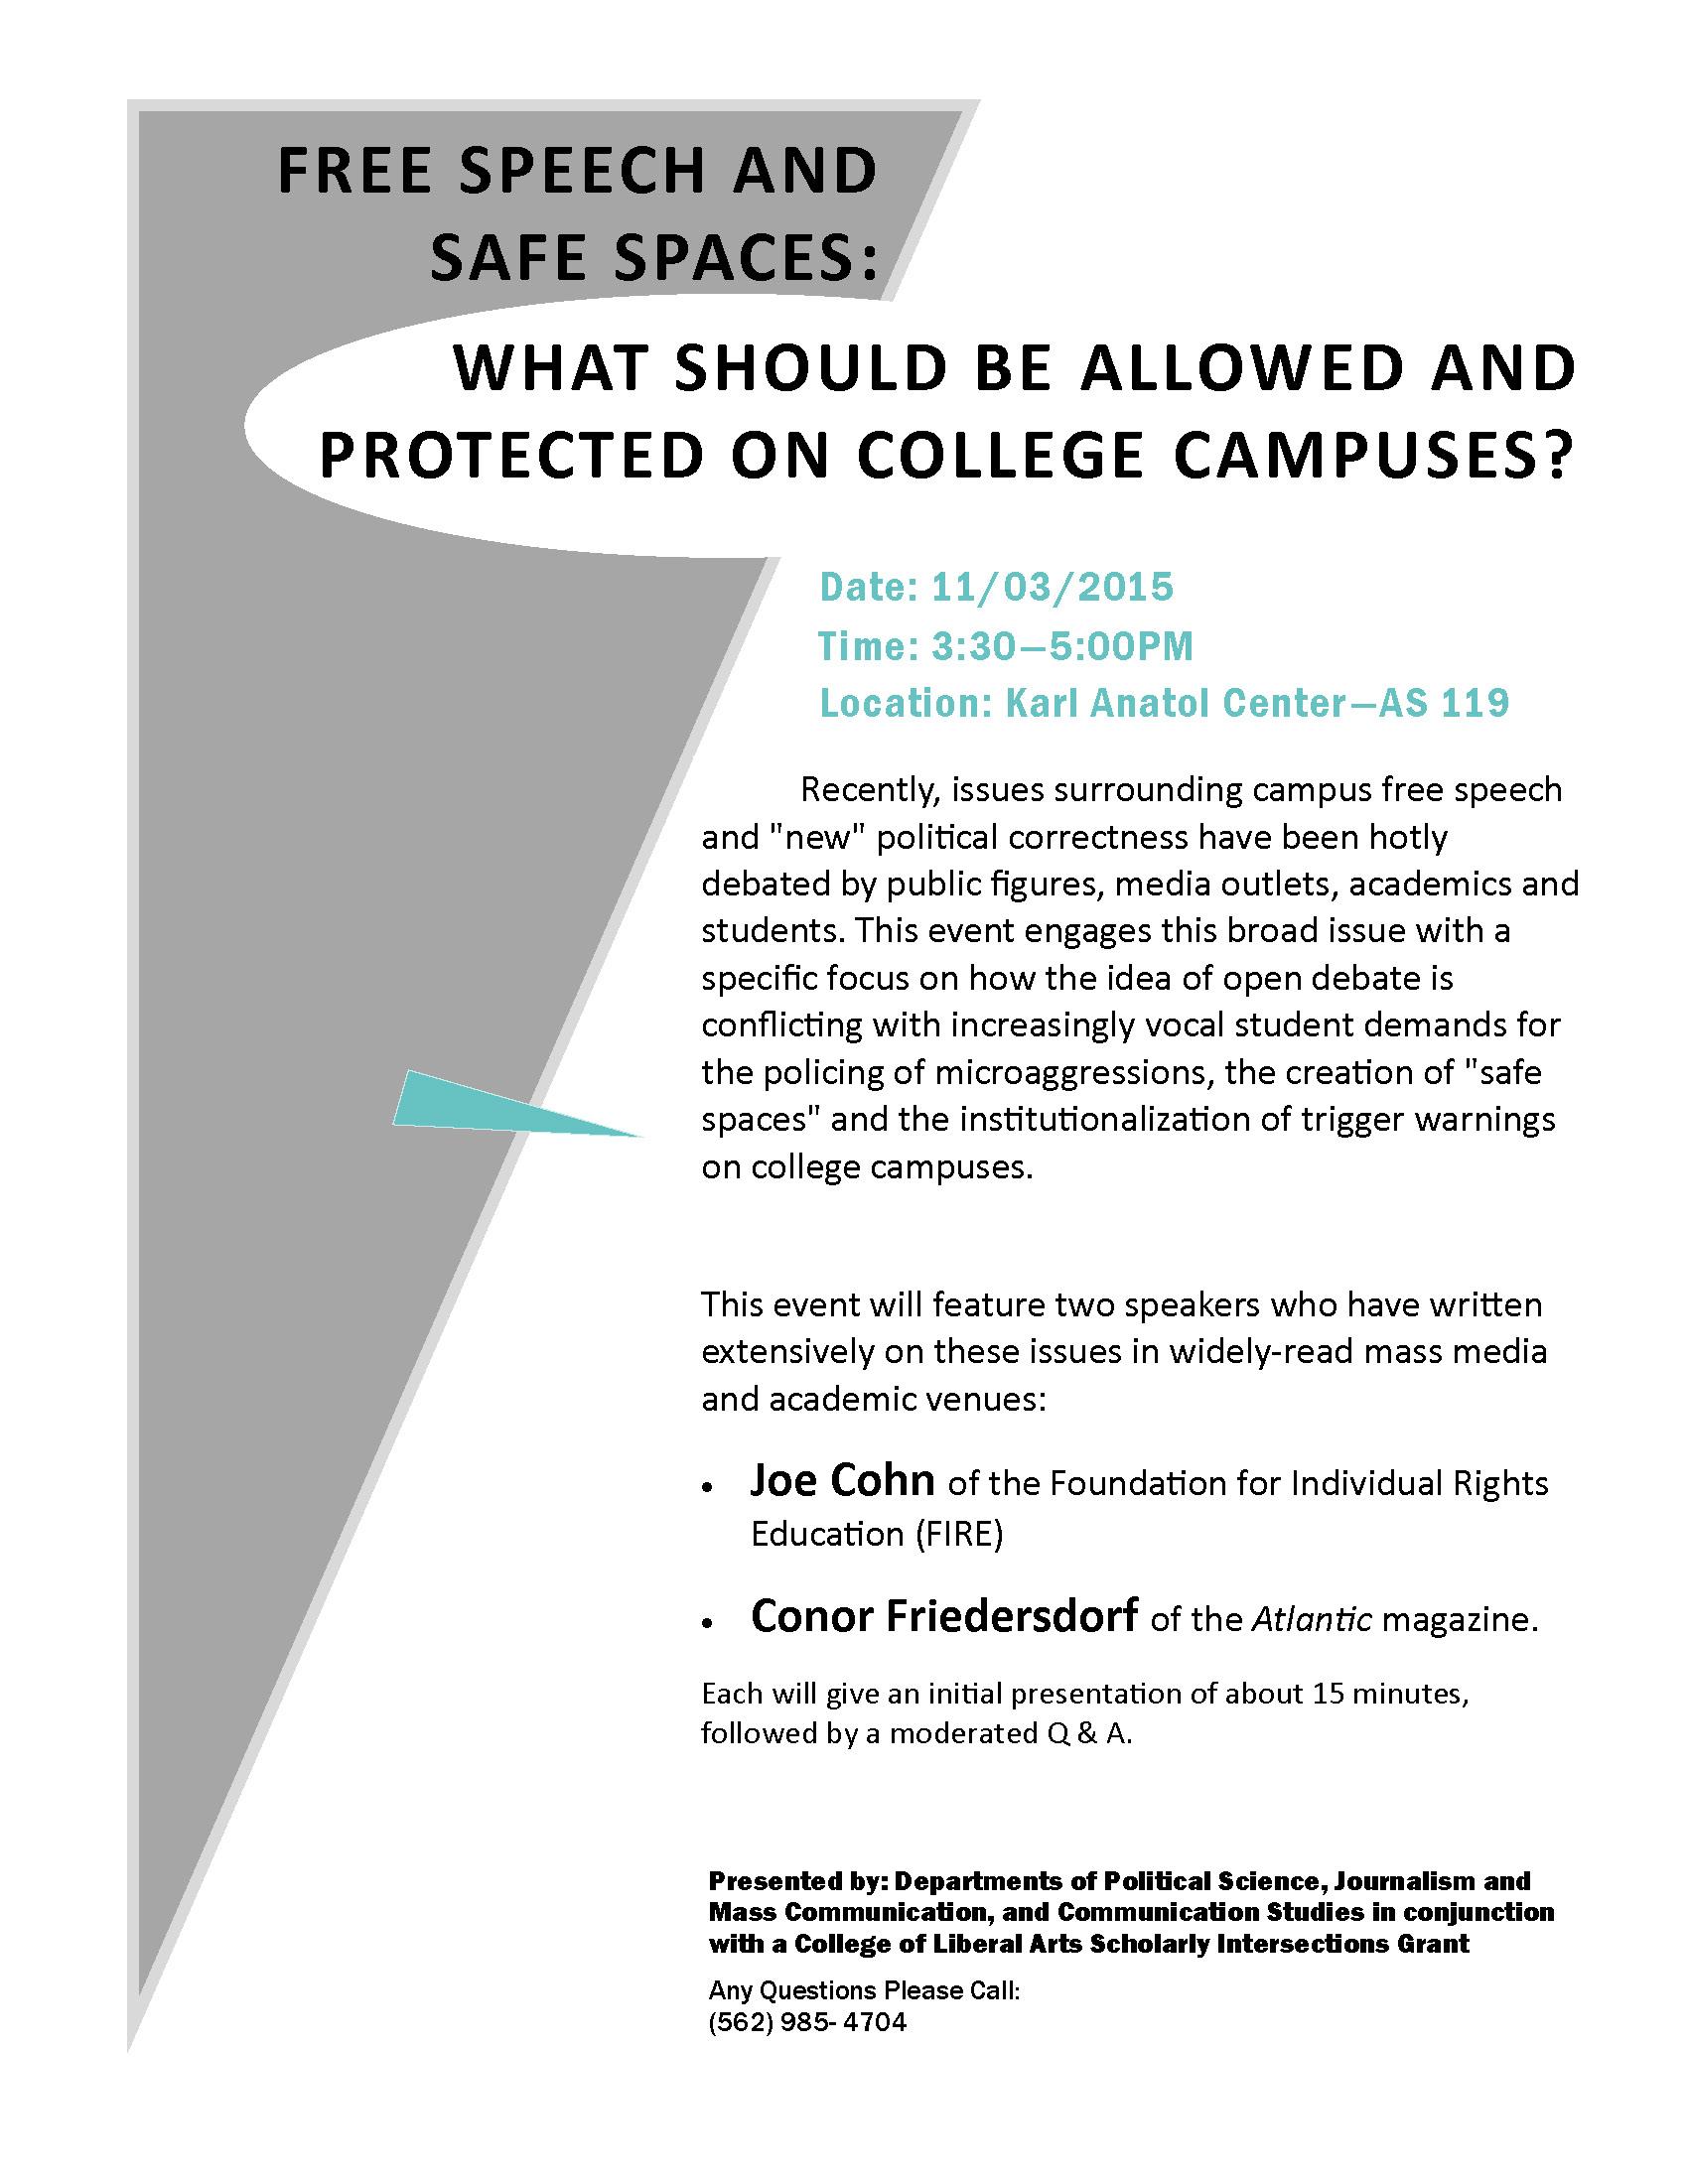 Free Speech Flyer v.2